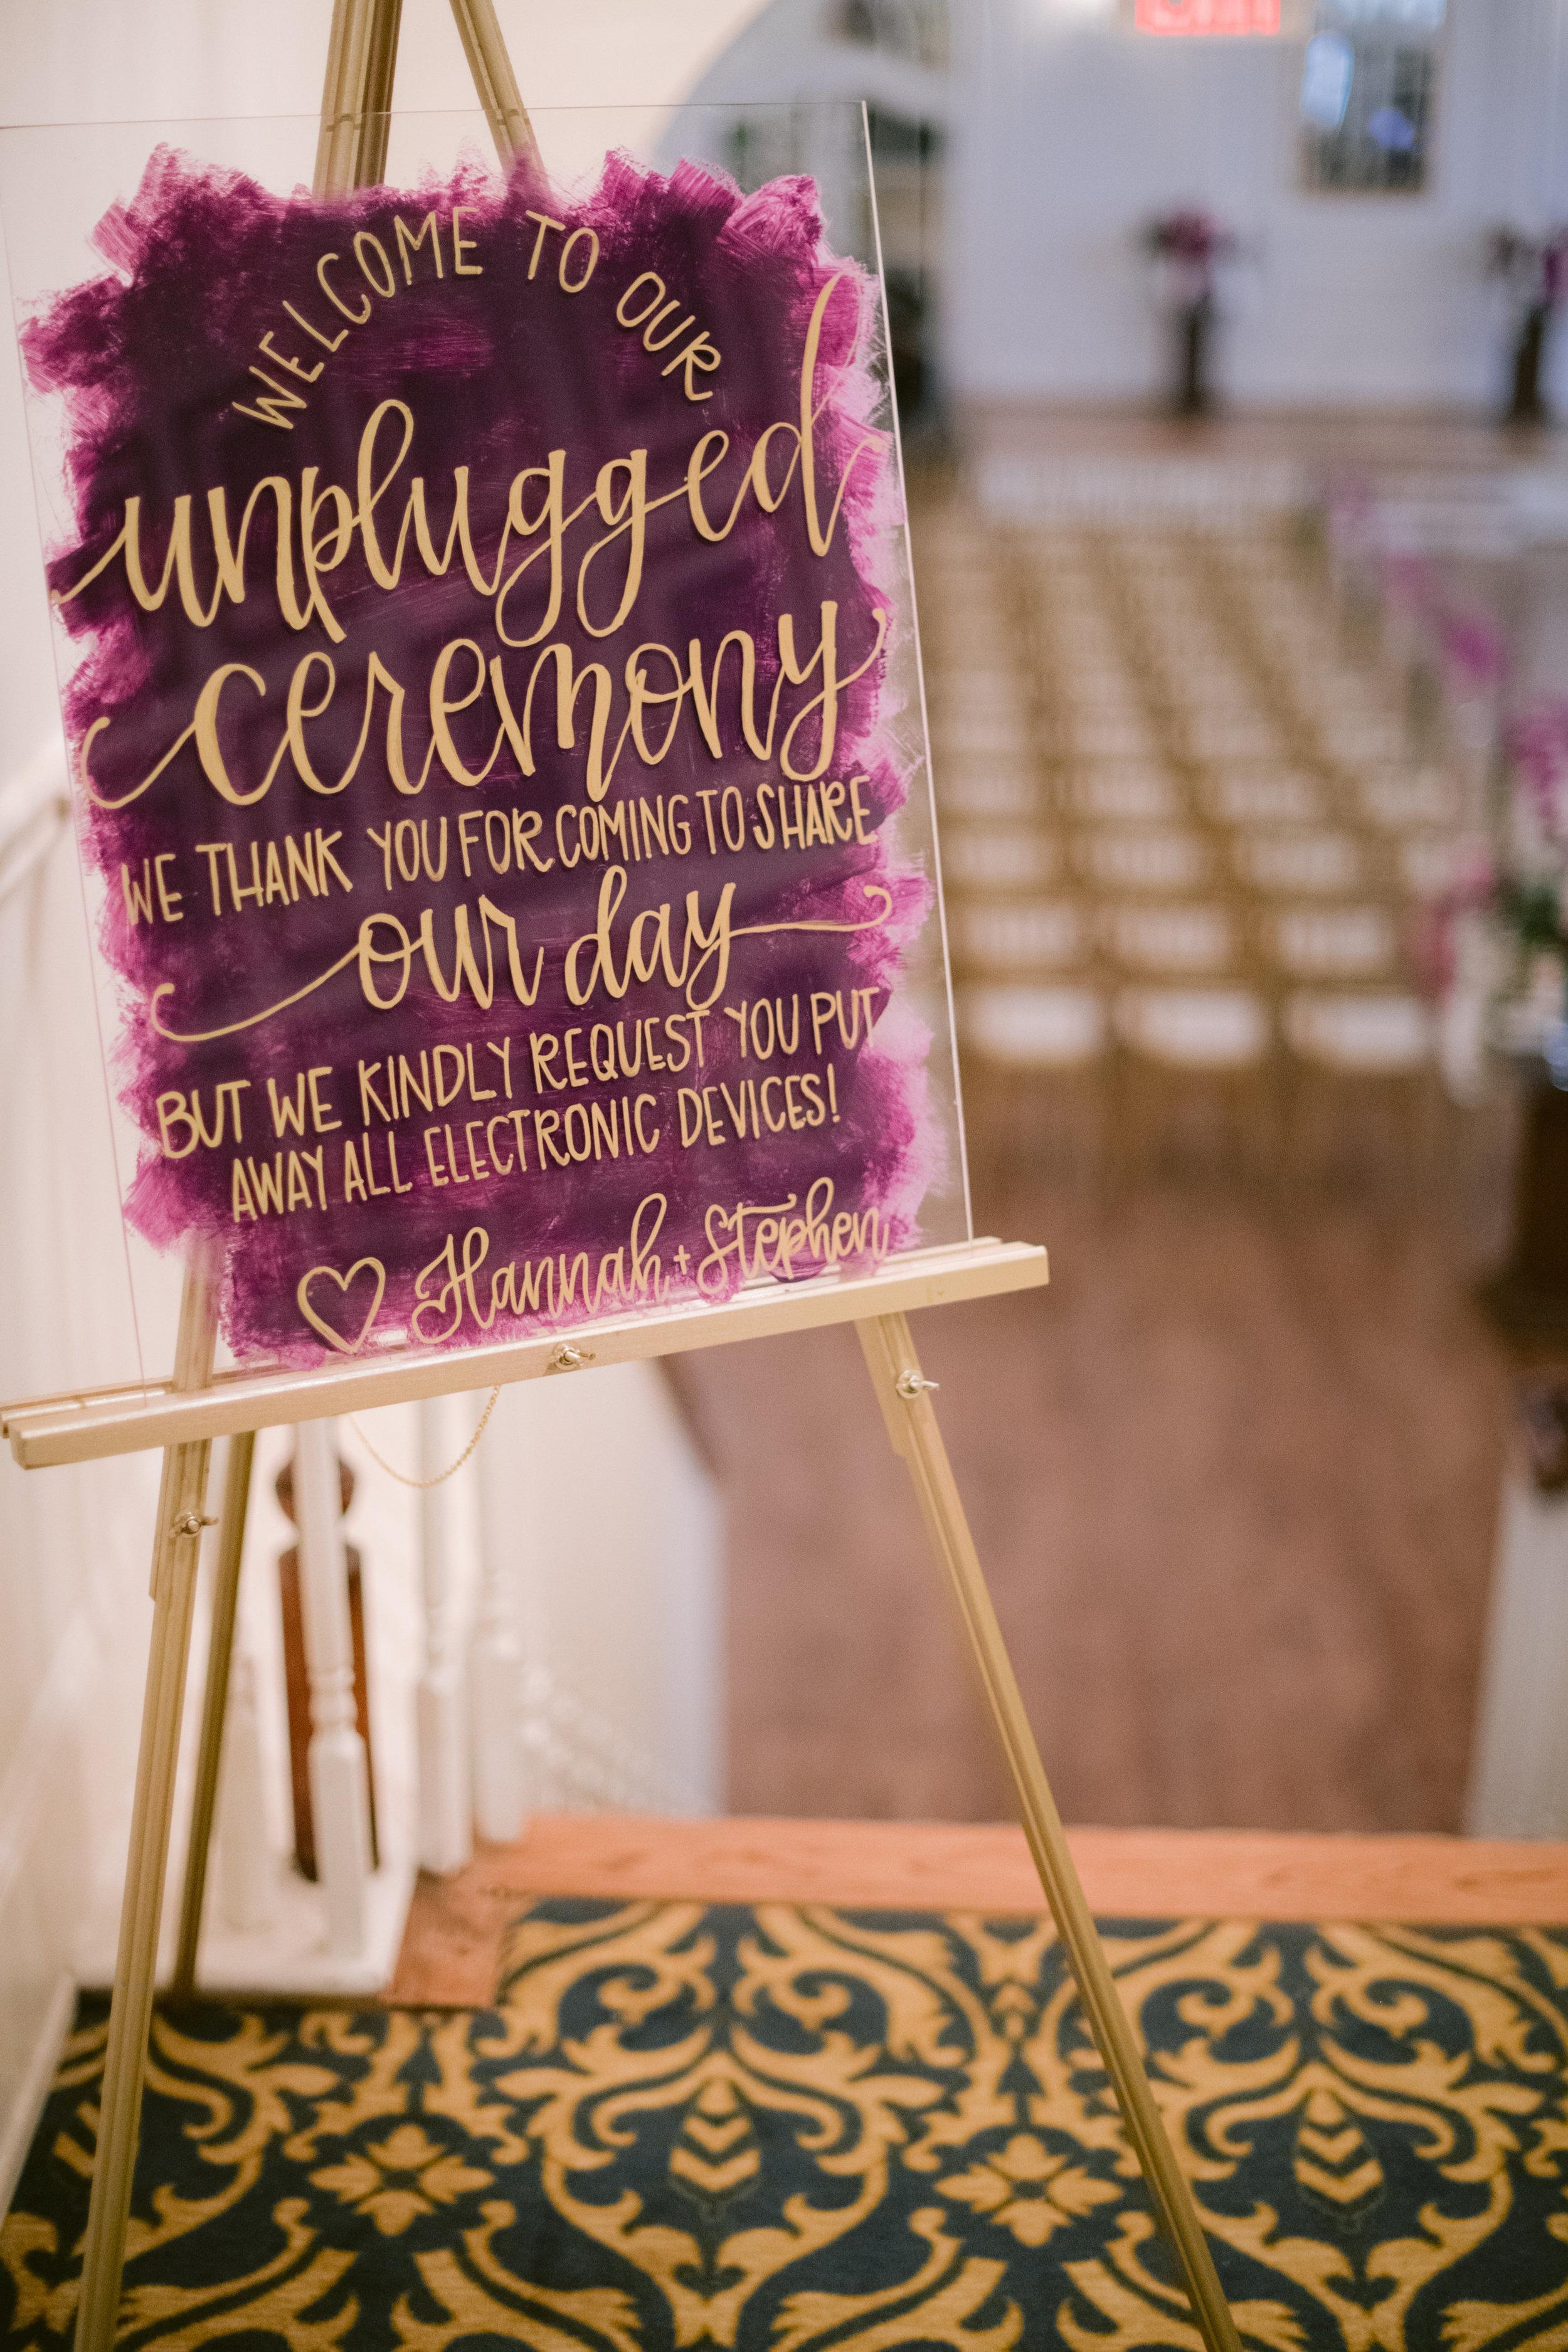 Unplugged wedding ceremony.